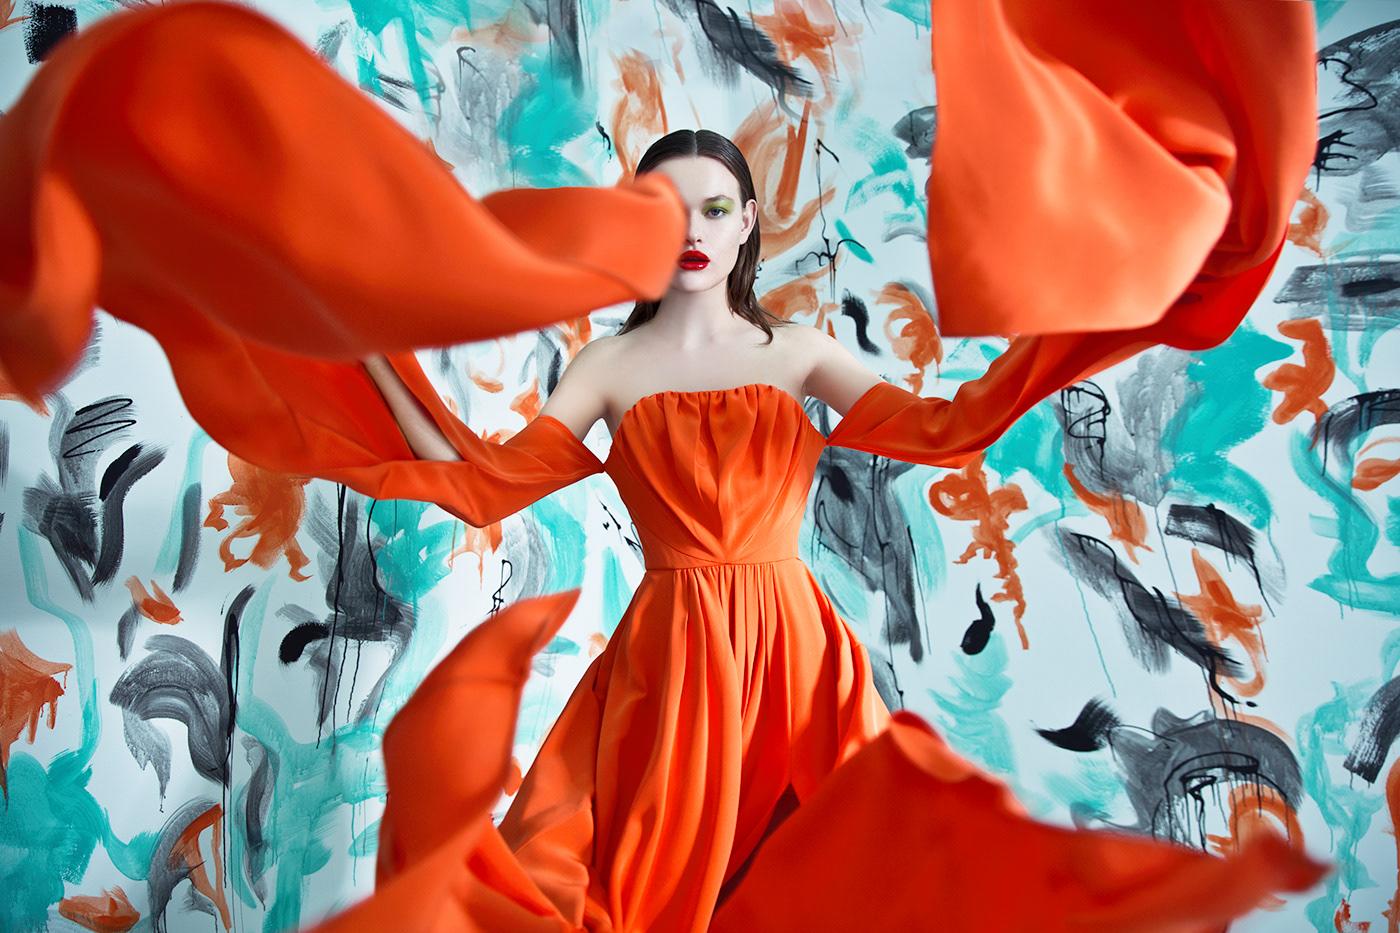 Paint me up / фотограф Ekaterina Belinskaya